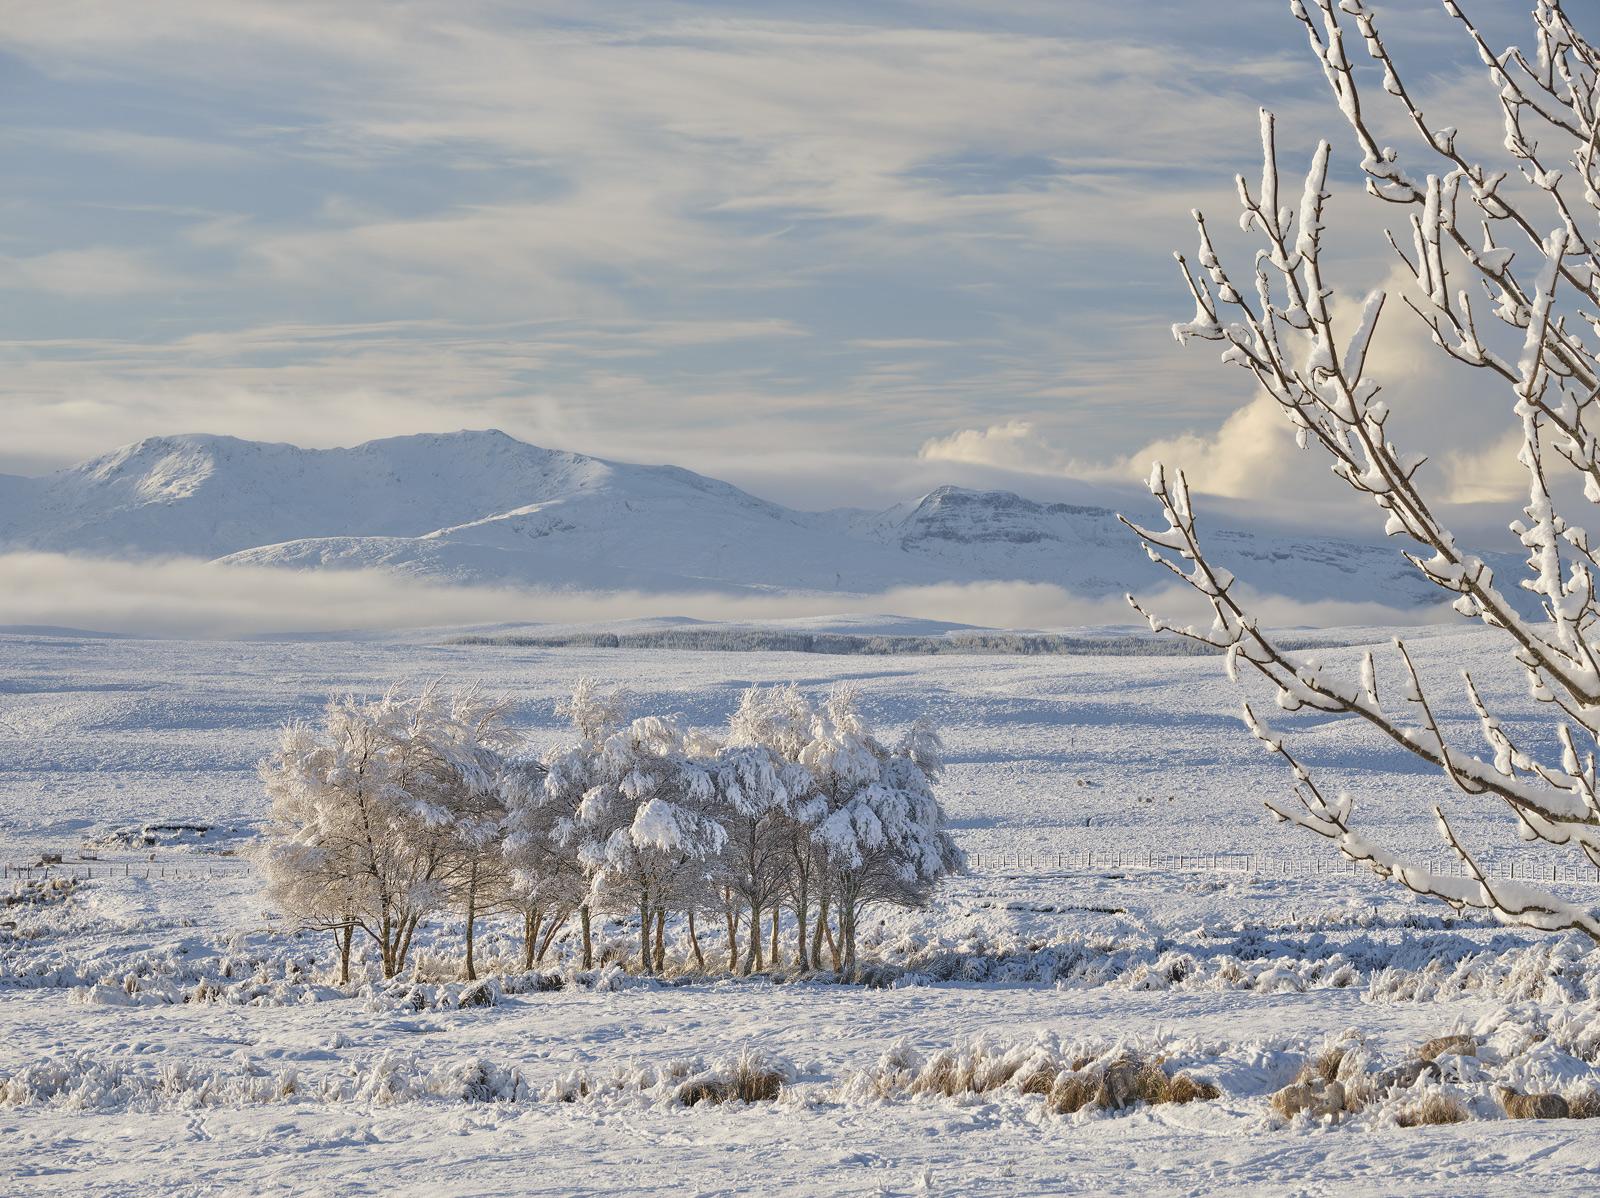 Winter Wonderland Crask Inn, Crask Inn, Sutherland, Scotland, winter, weather, Altnaharra, gorgeous, ruralised, mist, sn, photo